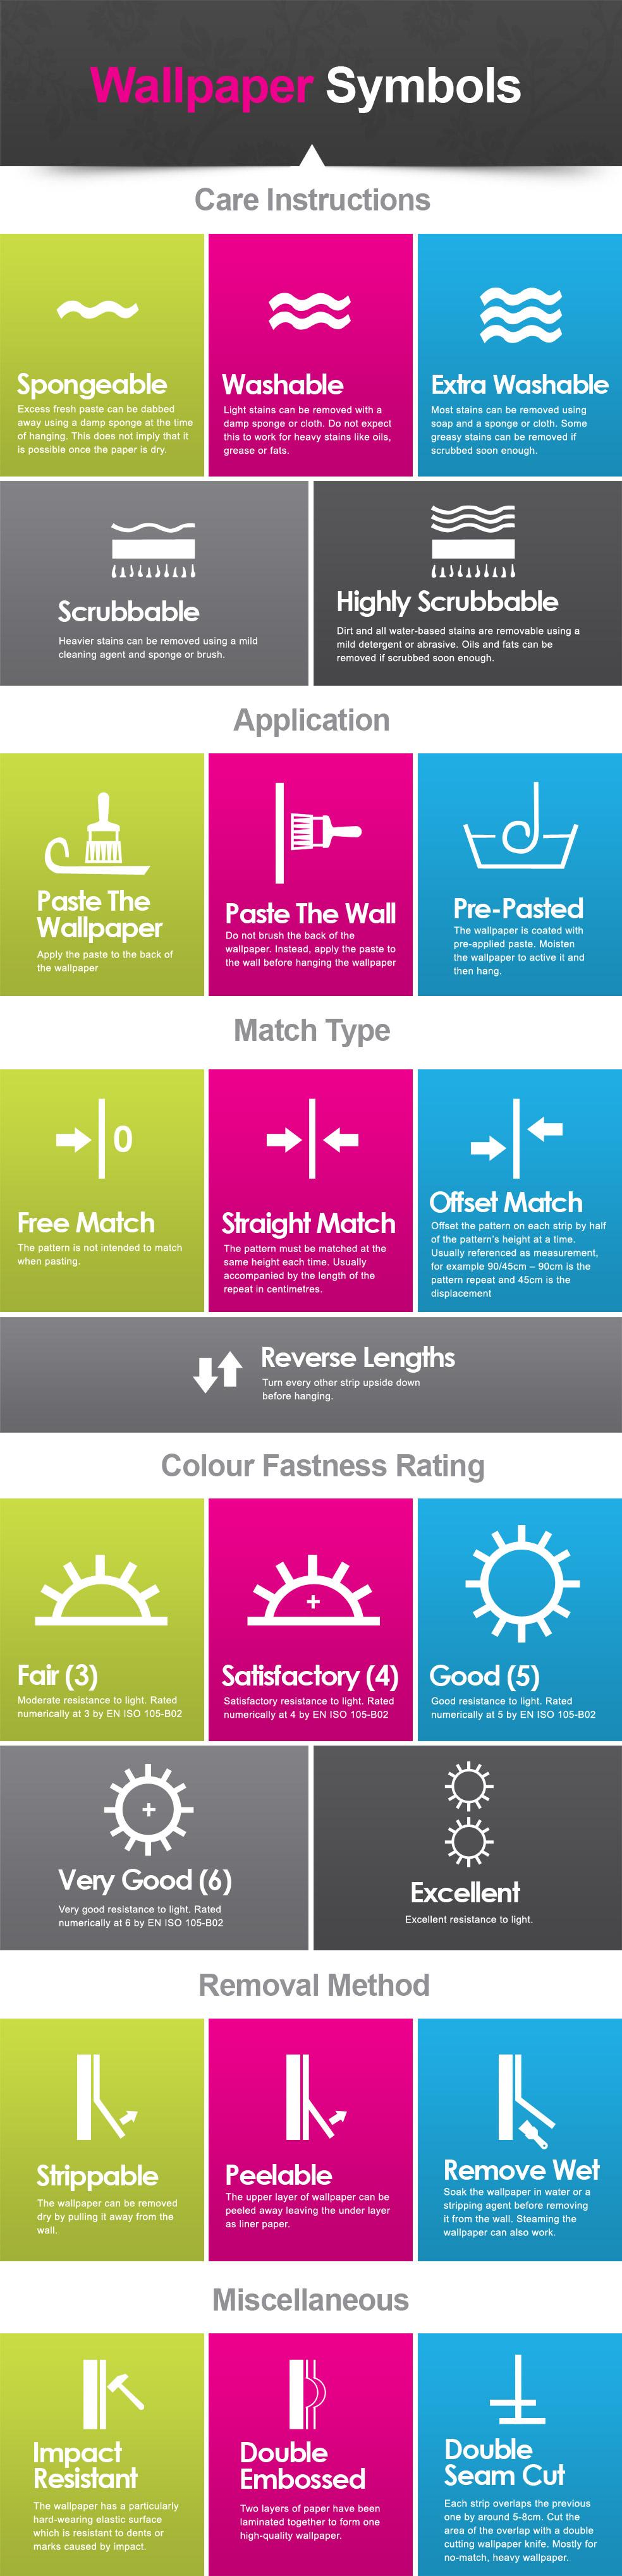 Wallpaper Symbols Guide Infographic